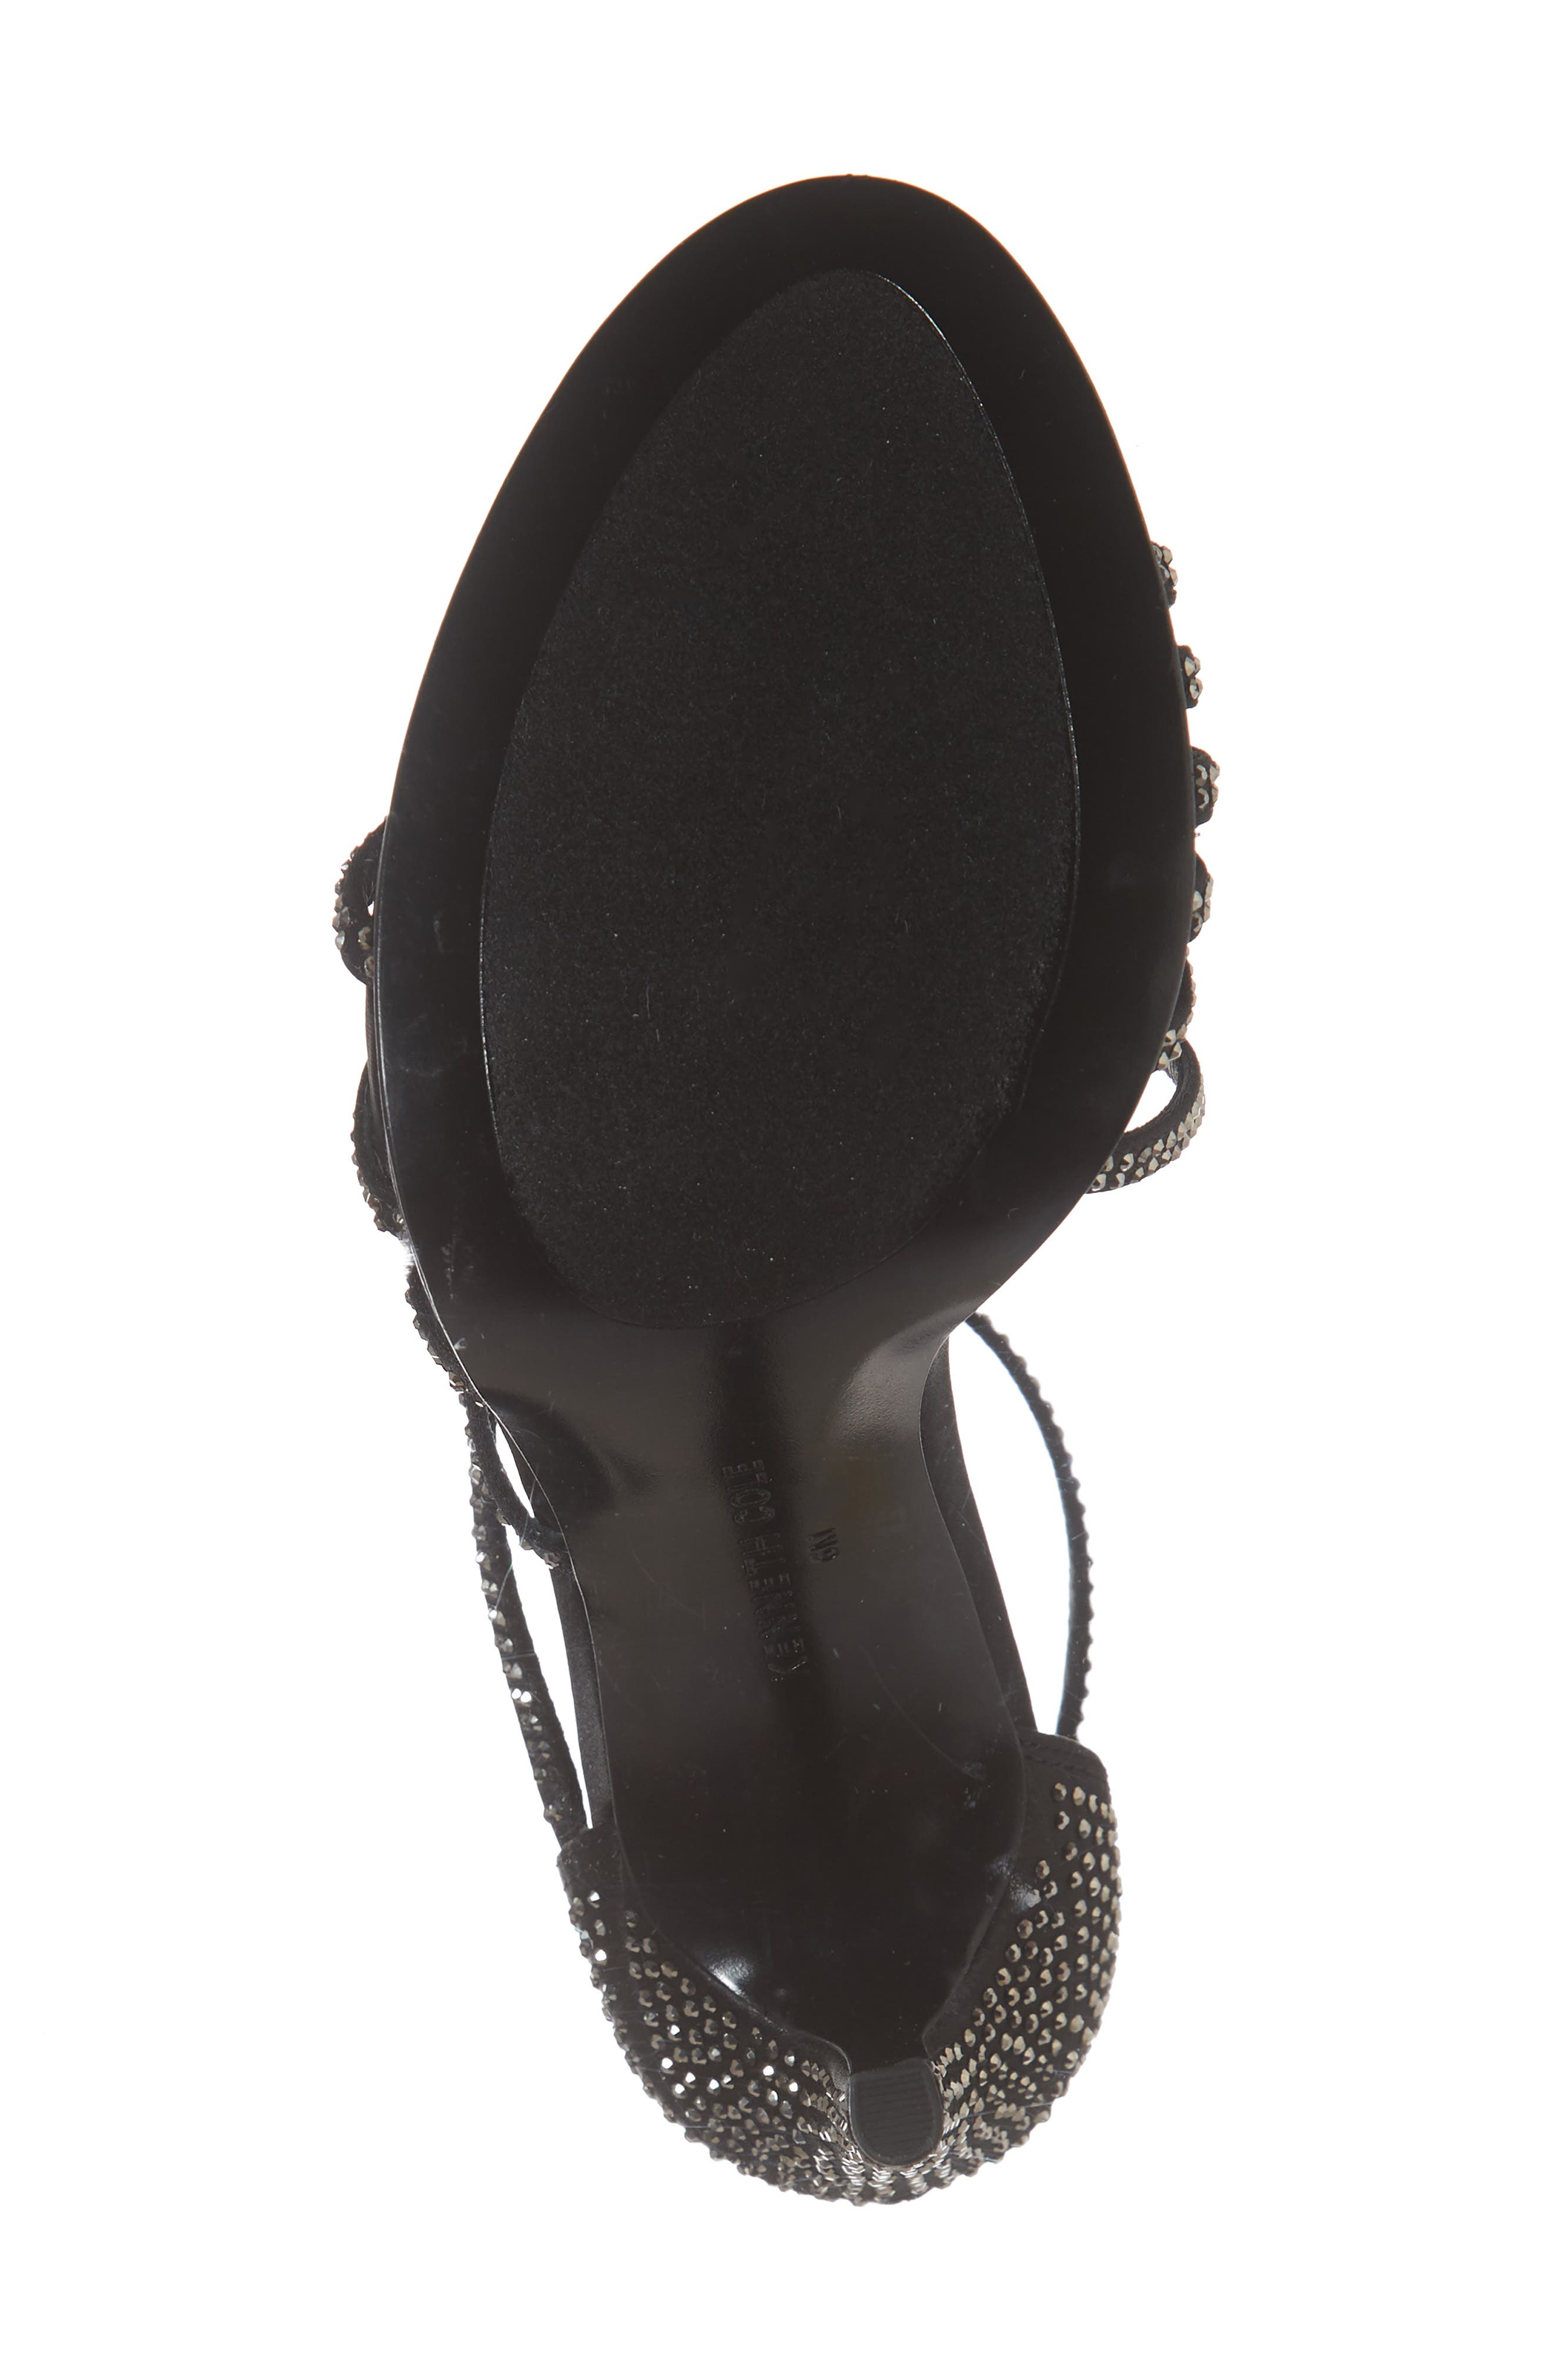 Barletta Asymmetrical Strappy Sandal,                             Alternate thumbnail 6, color,                             001